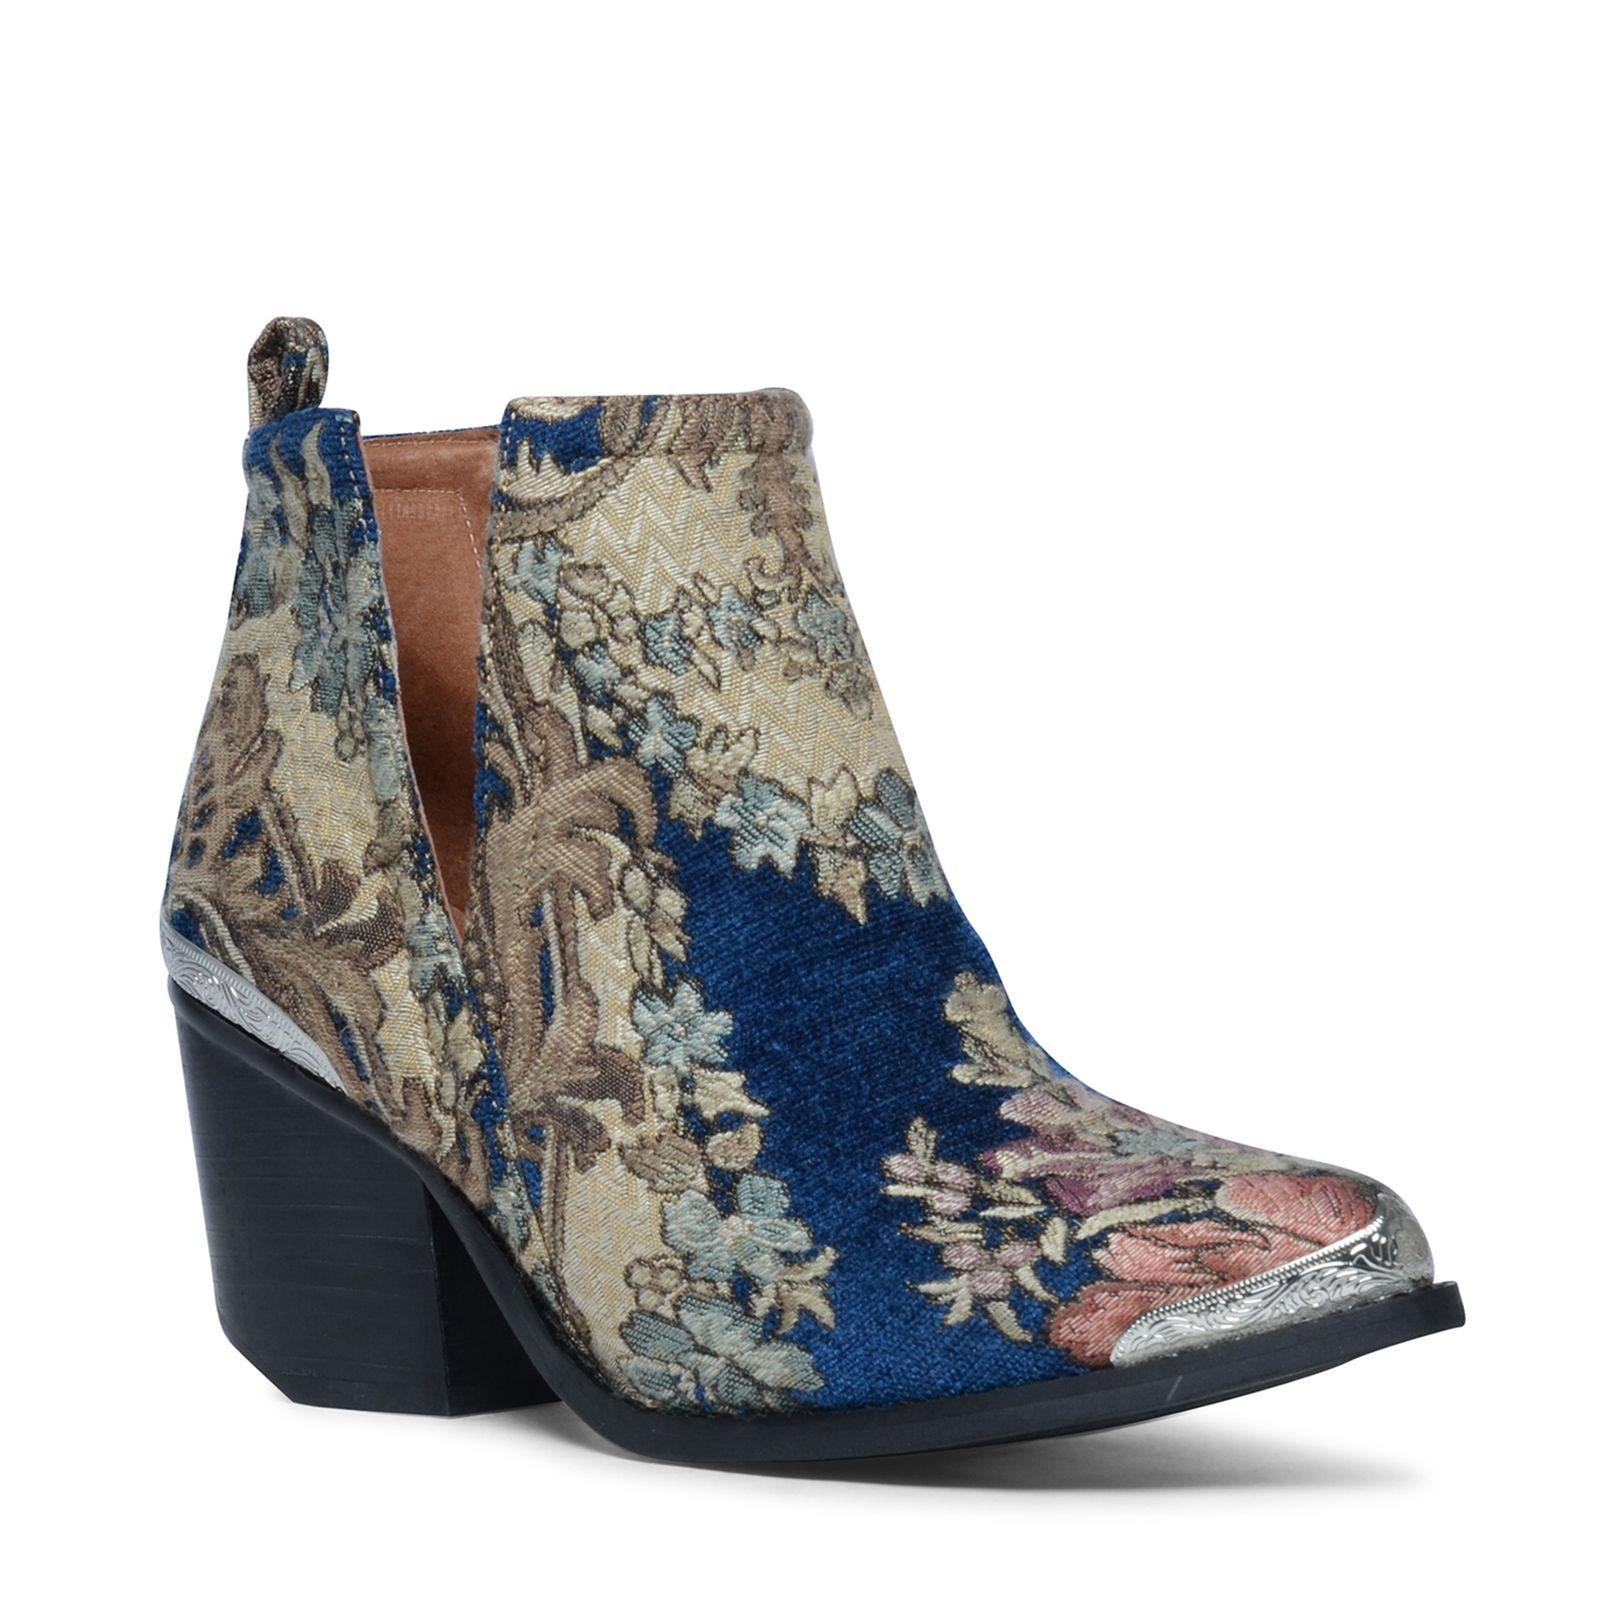 Chaussures Jeffrey Campbell grises Casual femme Rôdeur millu soft 54302–258–001 m - Noir - Noir BMtsadhwip